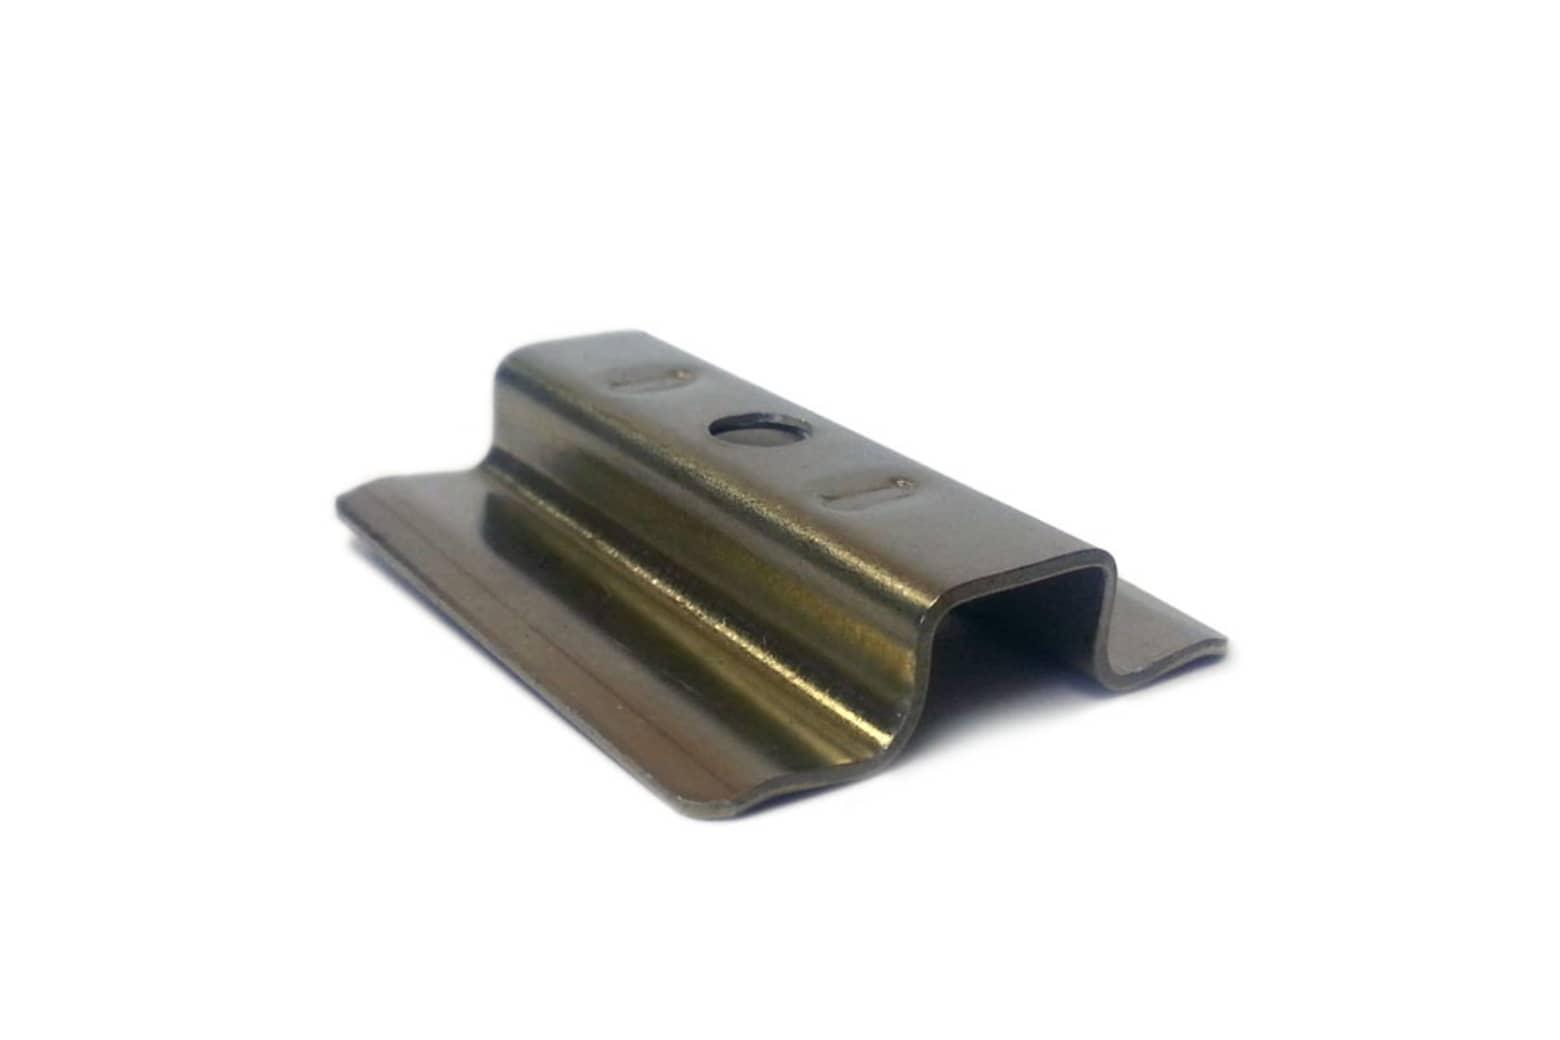 Decking Metal Clips for Teak Hidden Fixing Boards 100 pcs/box